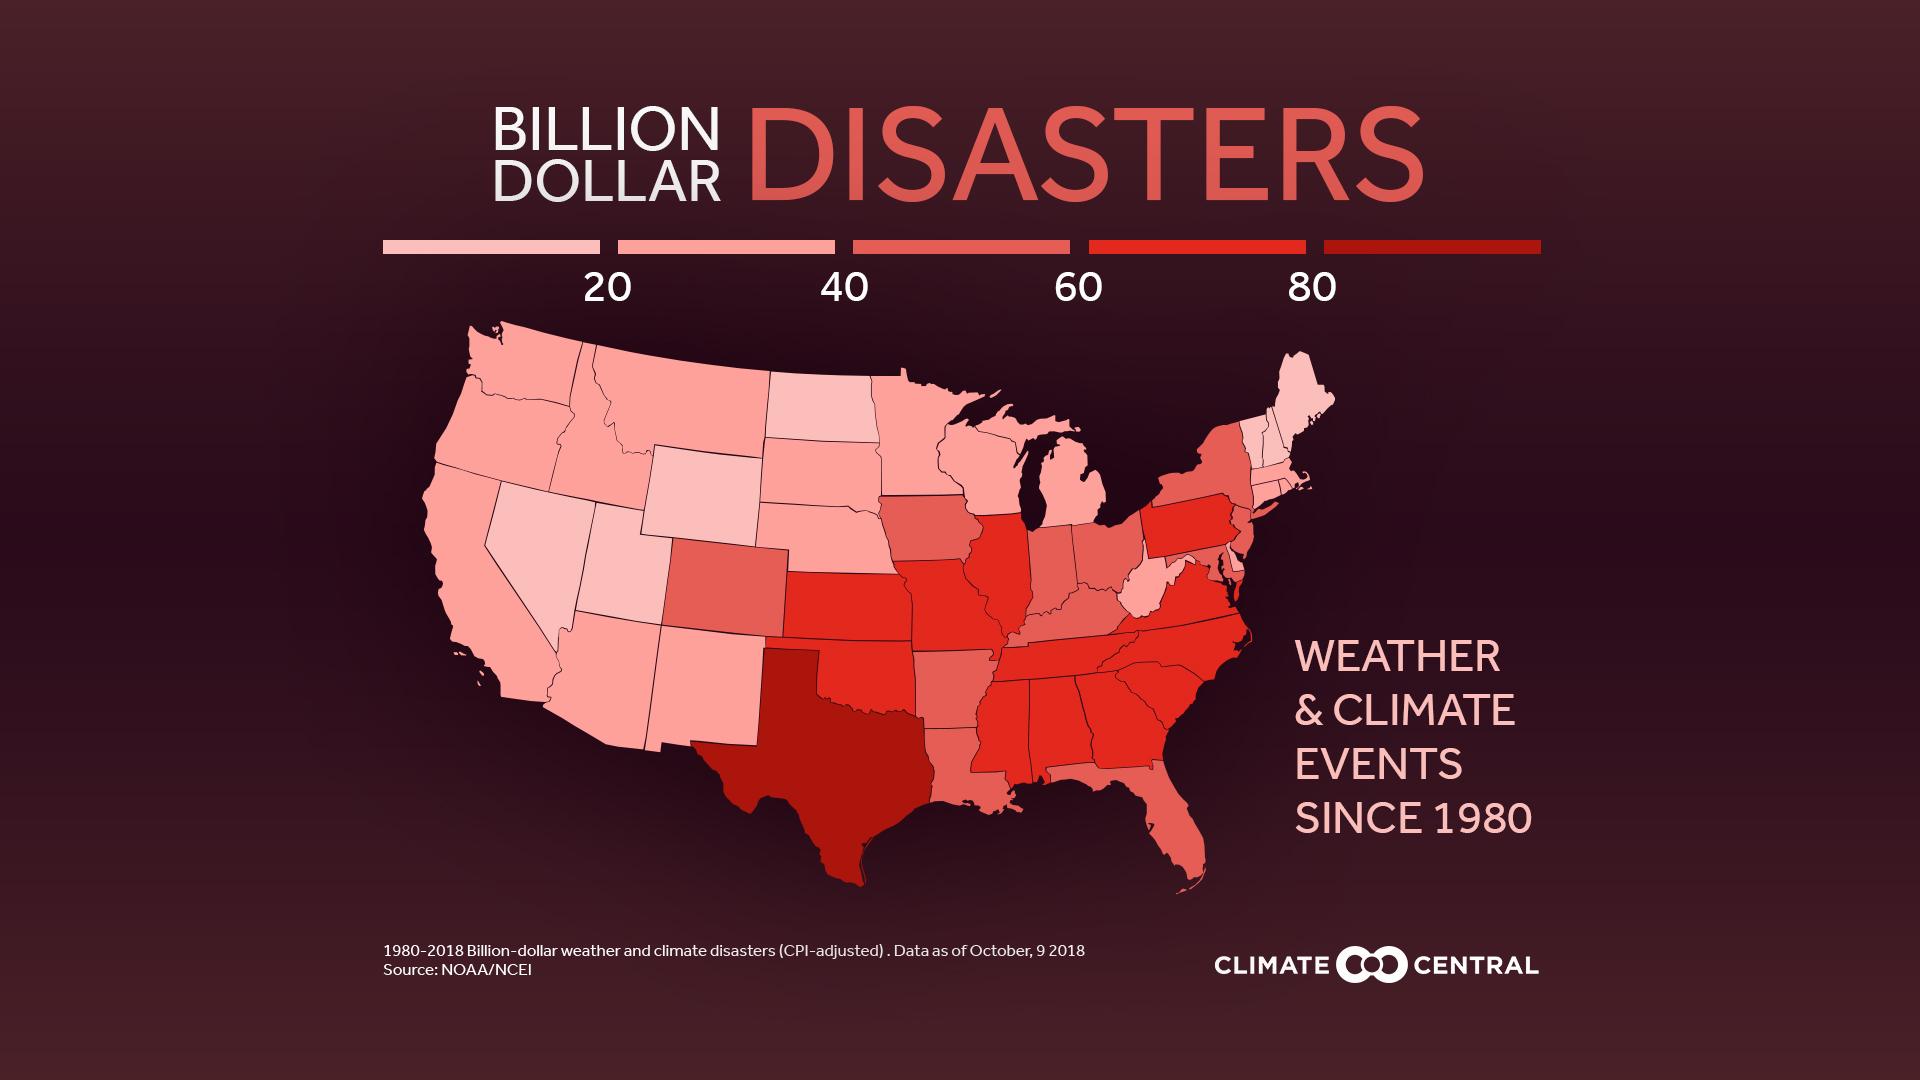 billion dollar disasters map